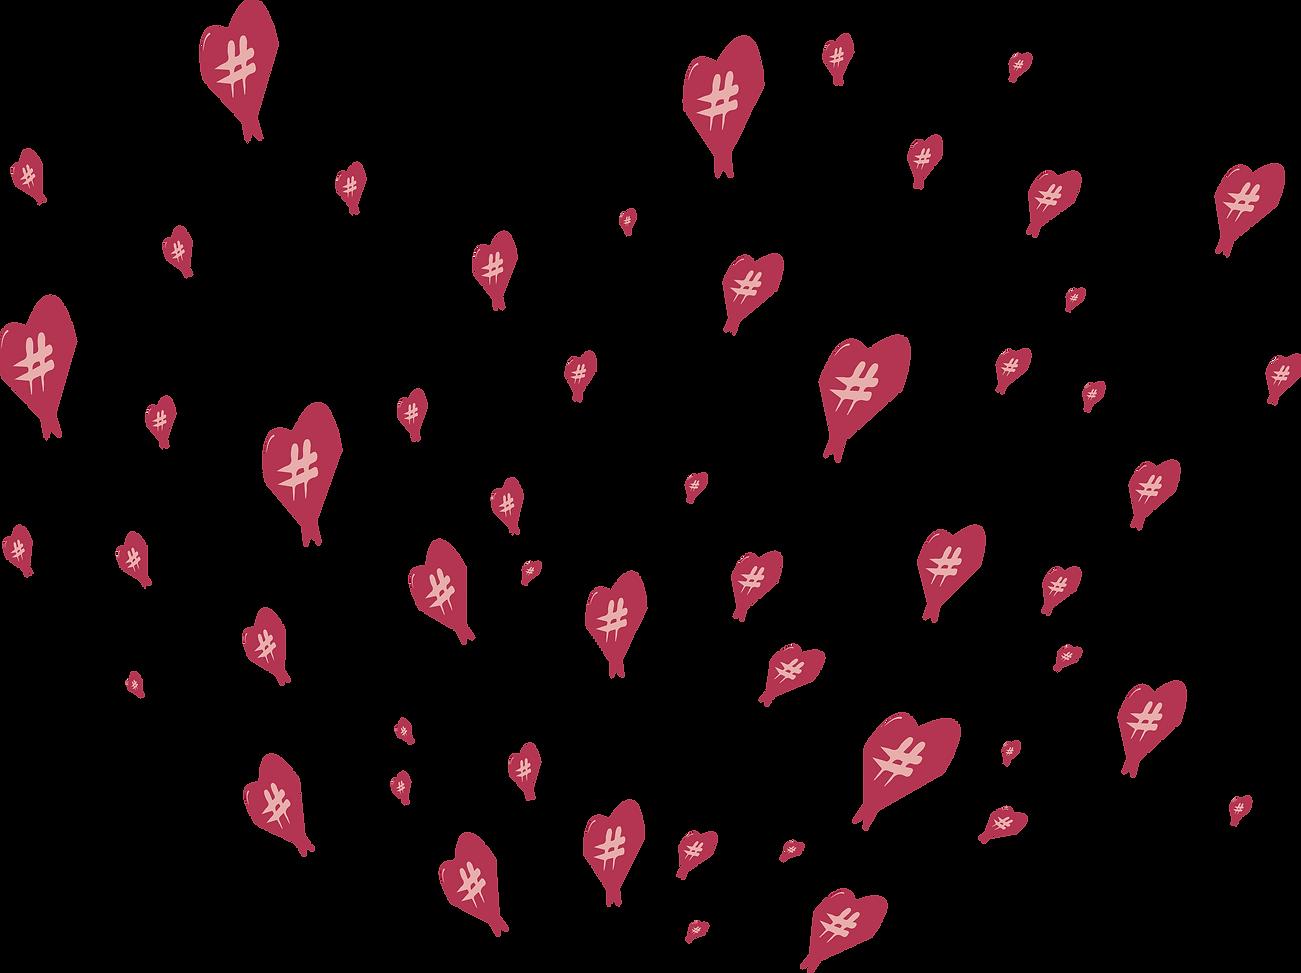 hearts 3.png